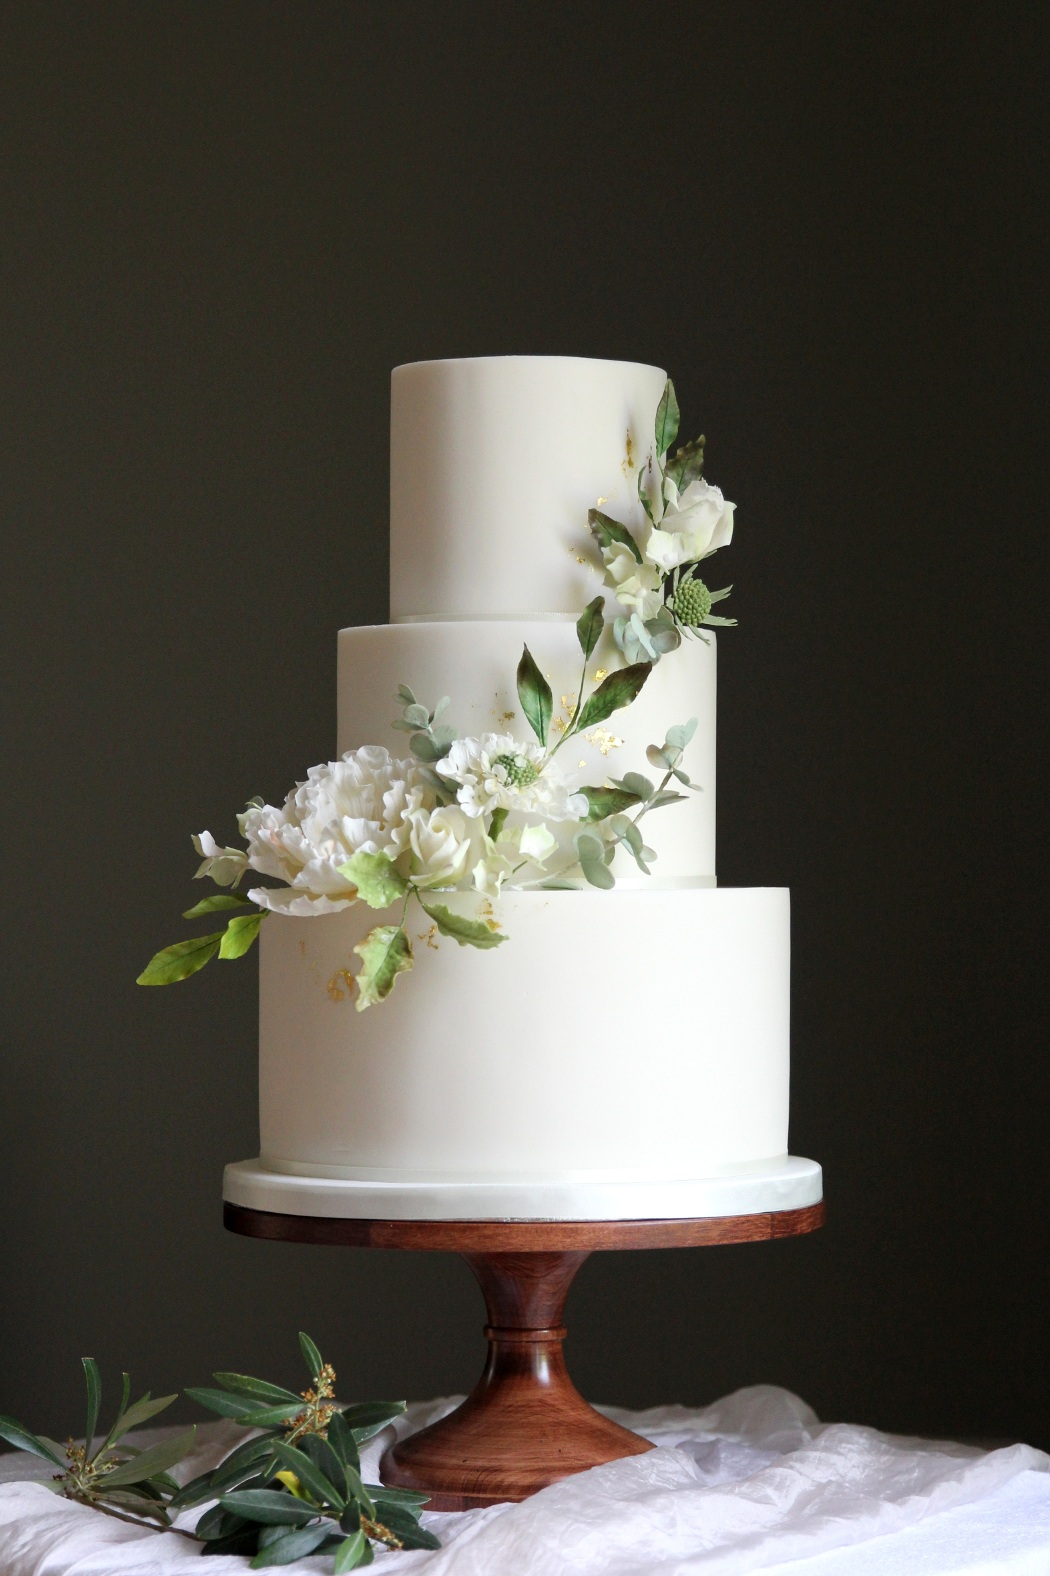 Cove+Cake+Design+2.jpg